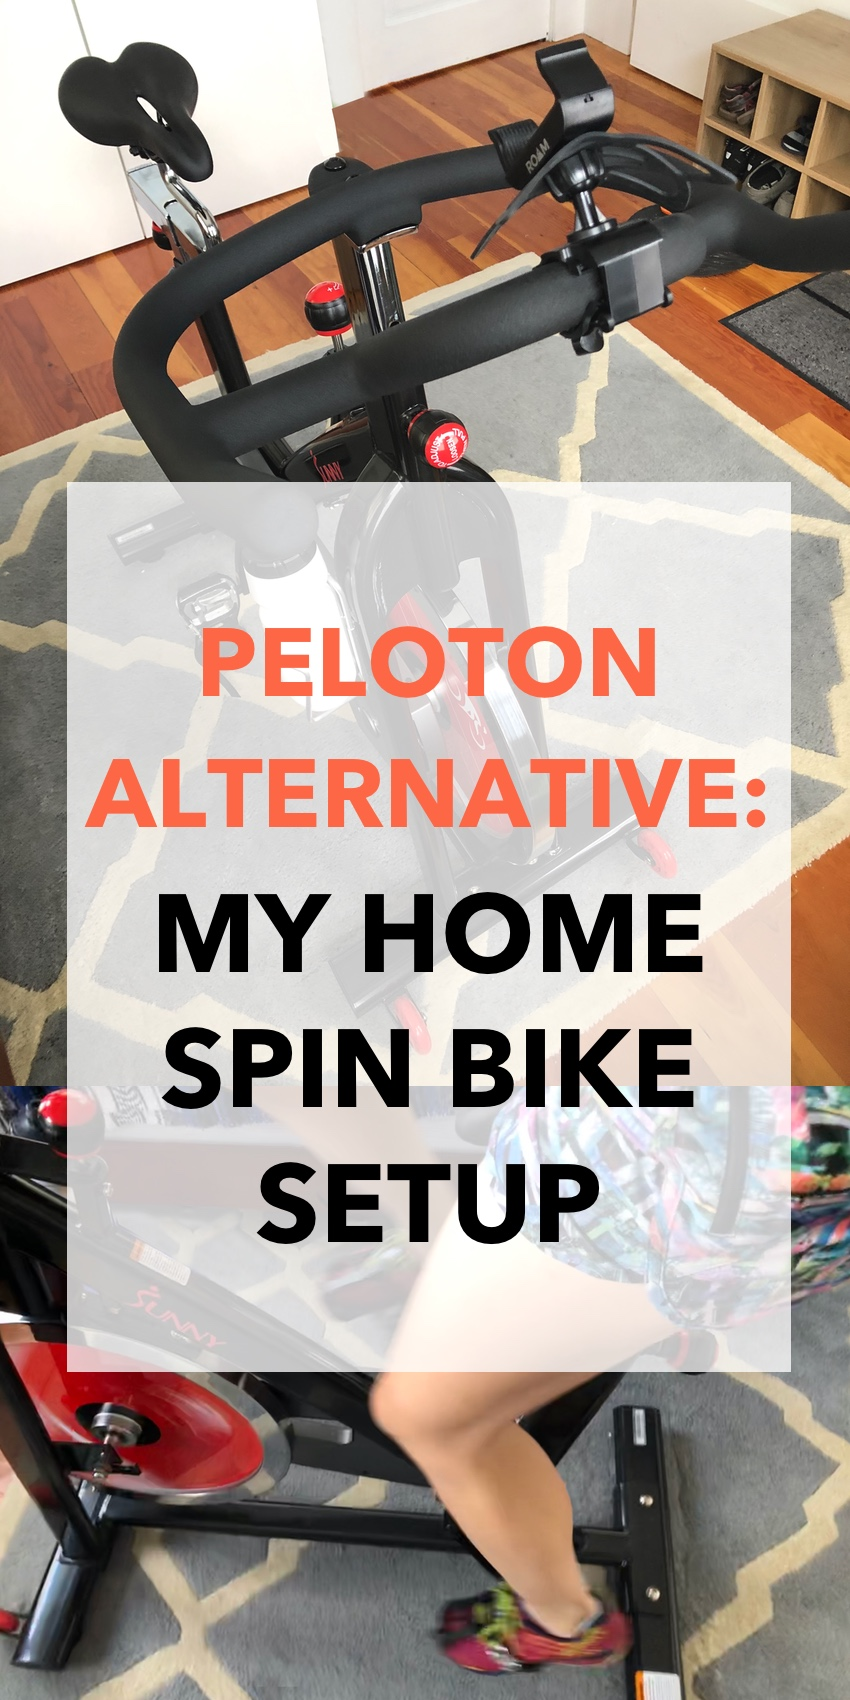 Peloton Alternative - My Home Spin Bike Setup